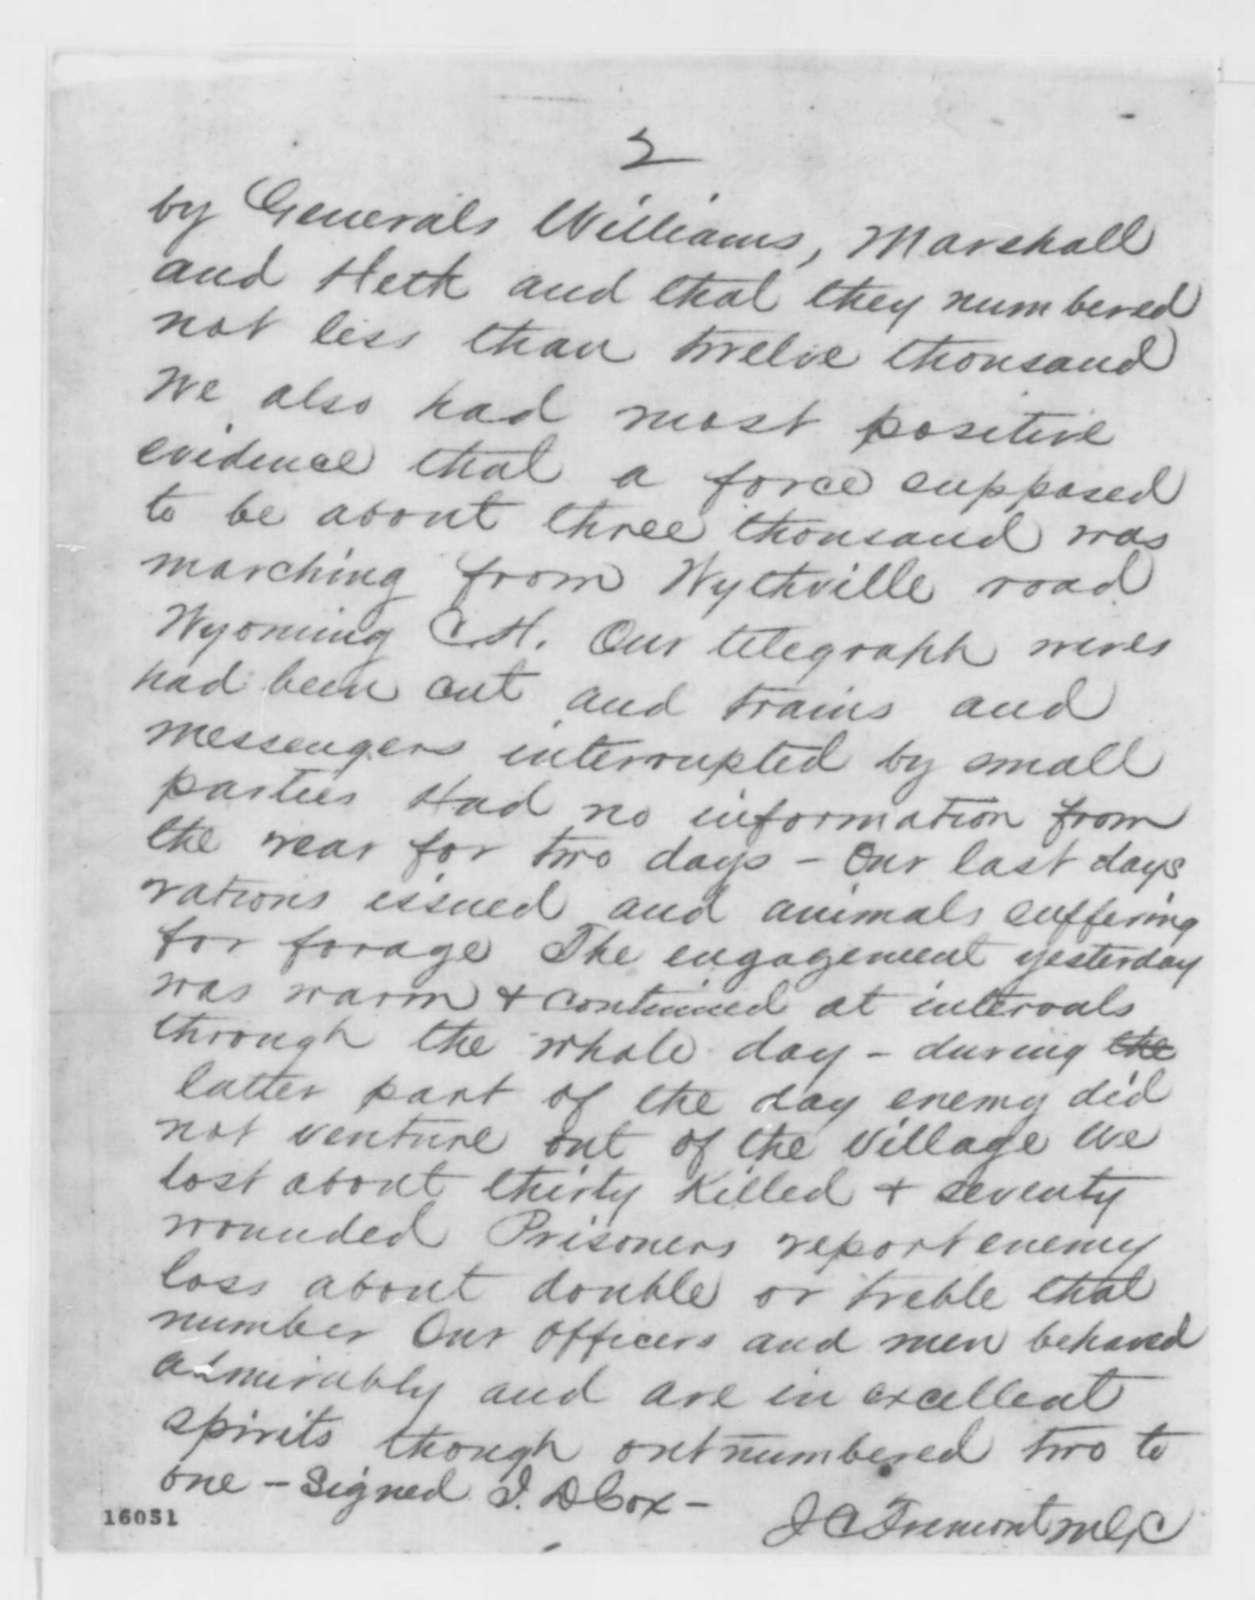 John C. Fremont to Edwin M. Stanton, Monday, May 19, 1862  (Telegram regarding military affairs)